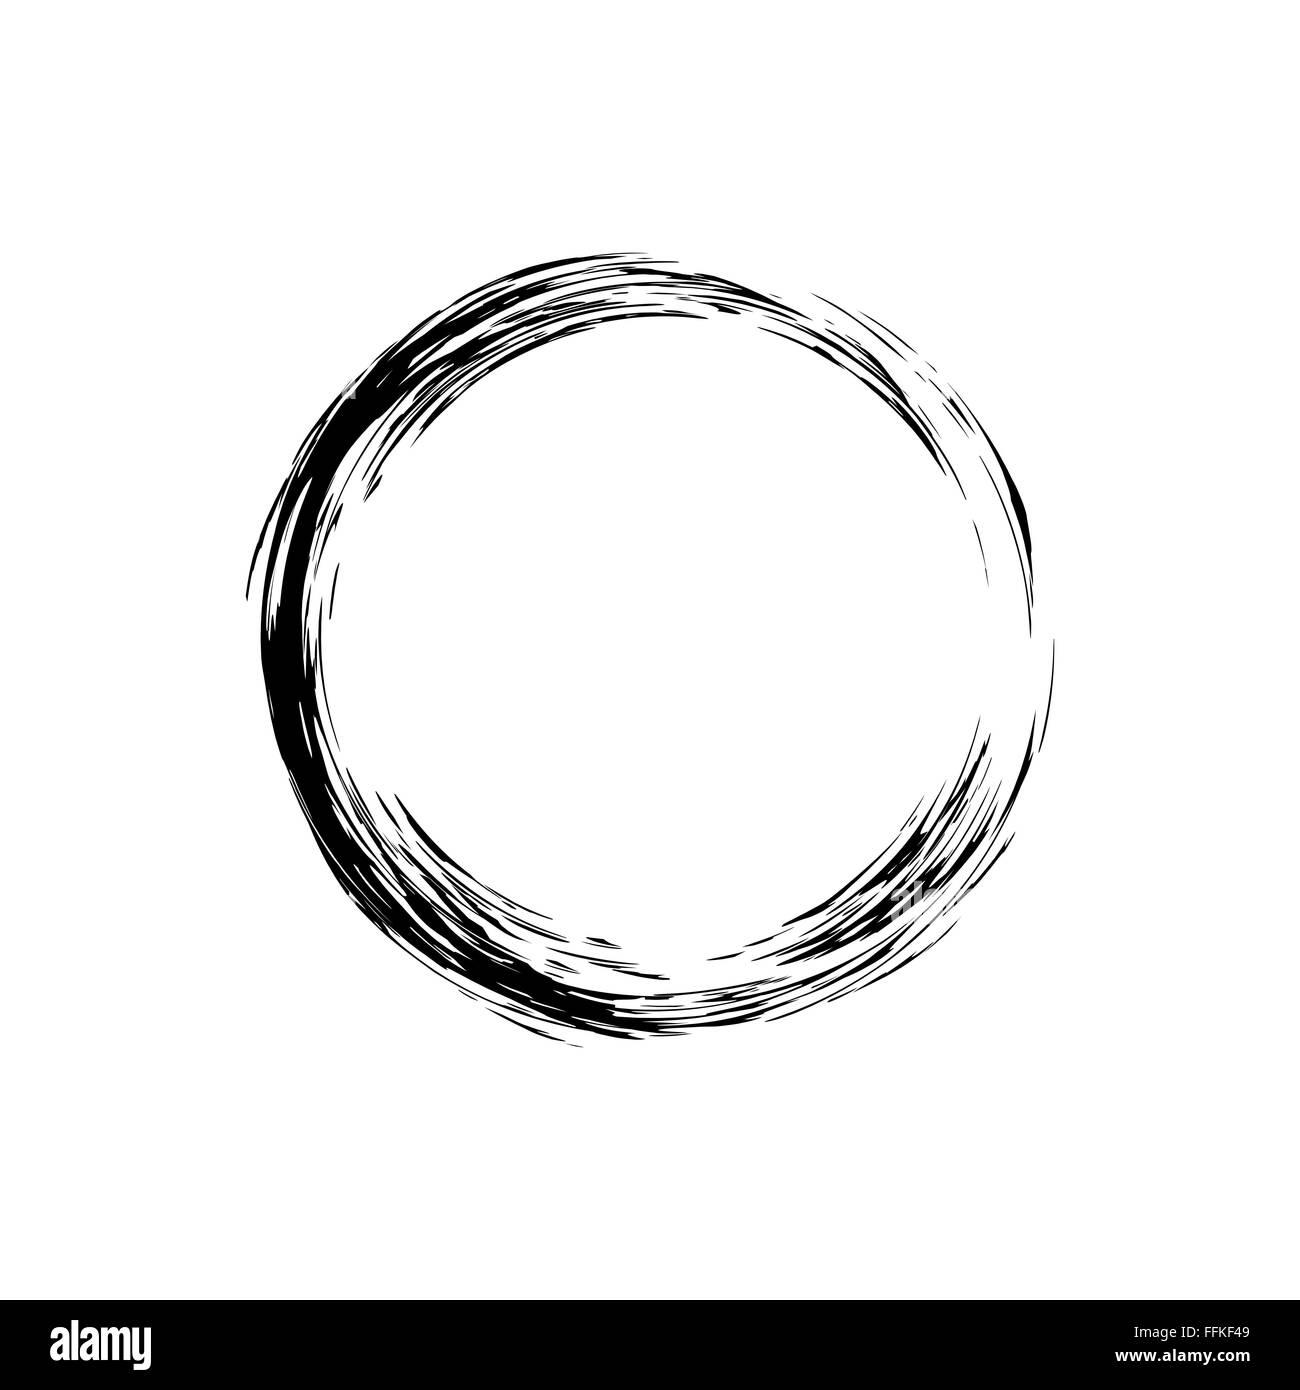 of vector grunge circle - photo #21